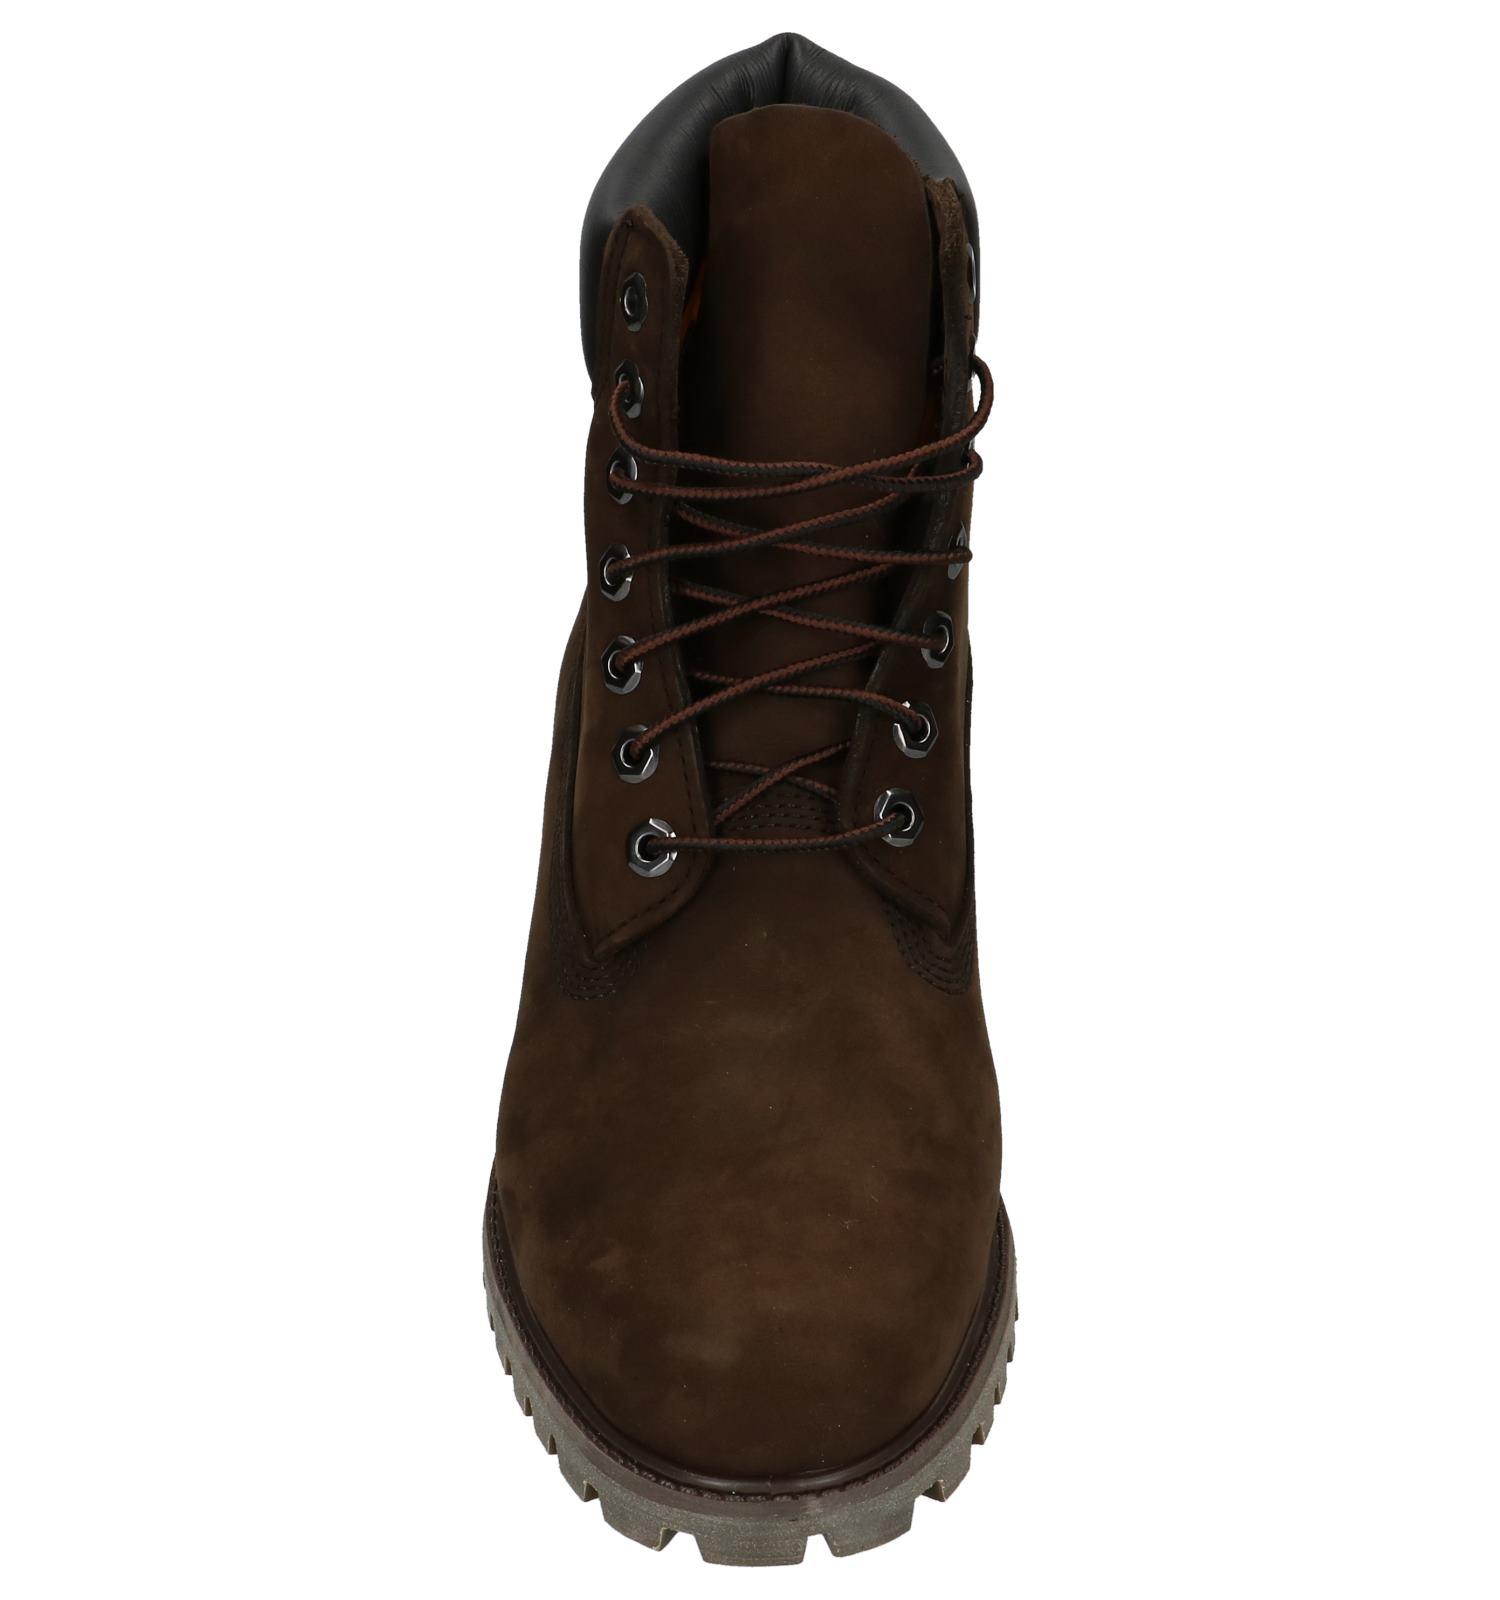 6 Torfs Gratis be Inch Timberland Boots Premium Donkerbruin 6qw5X80x